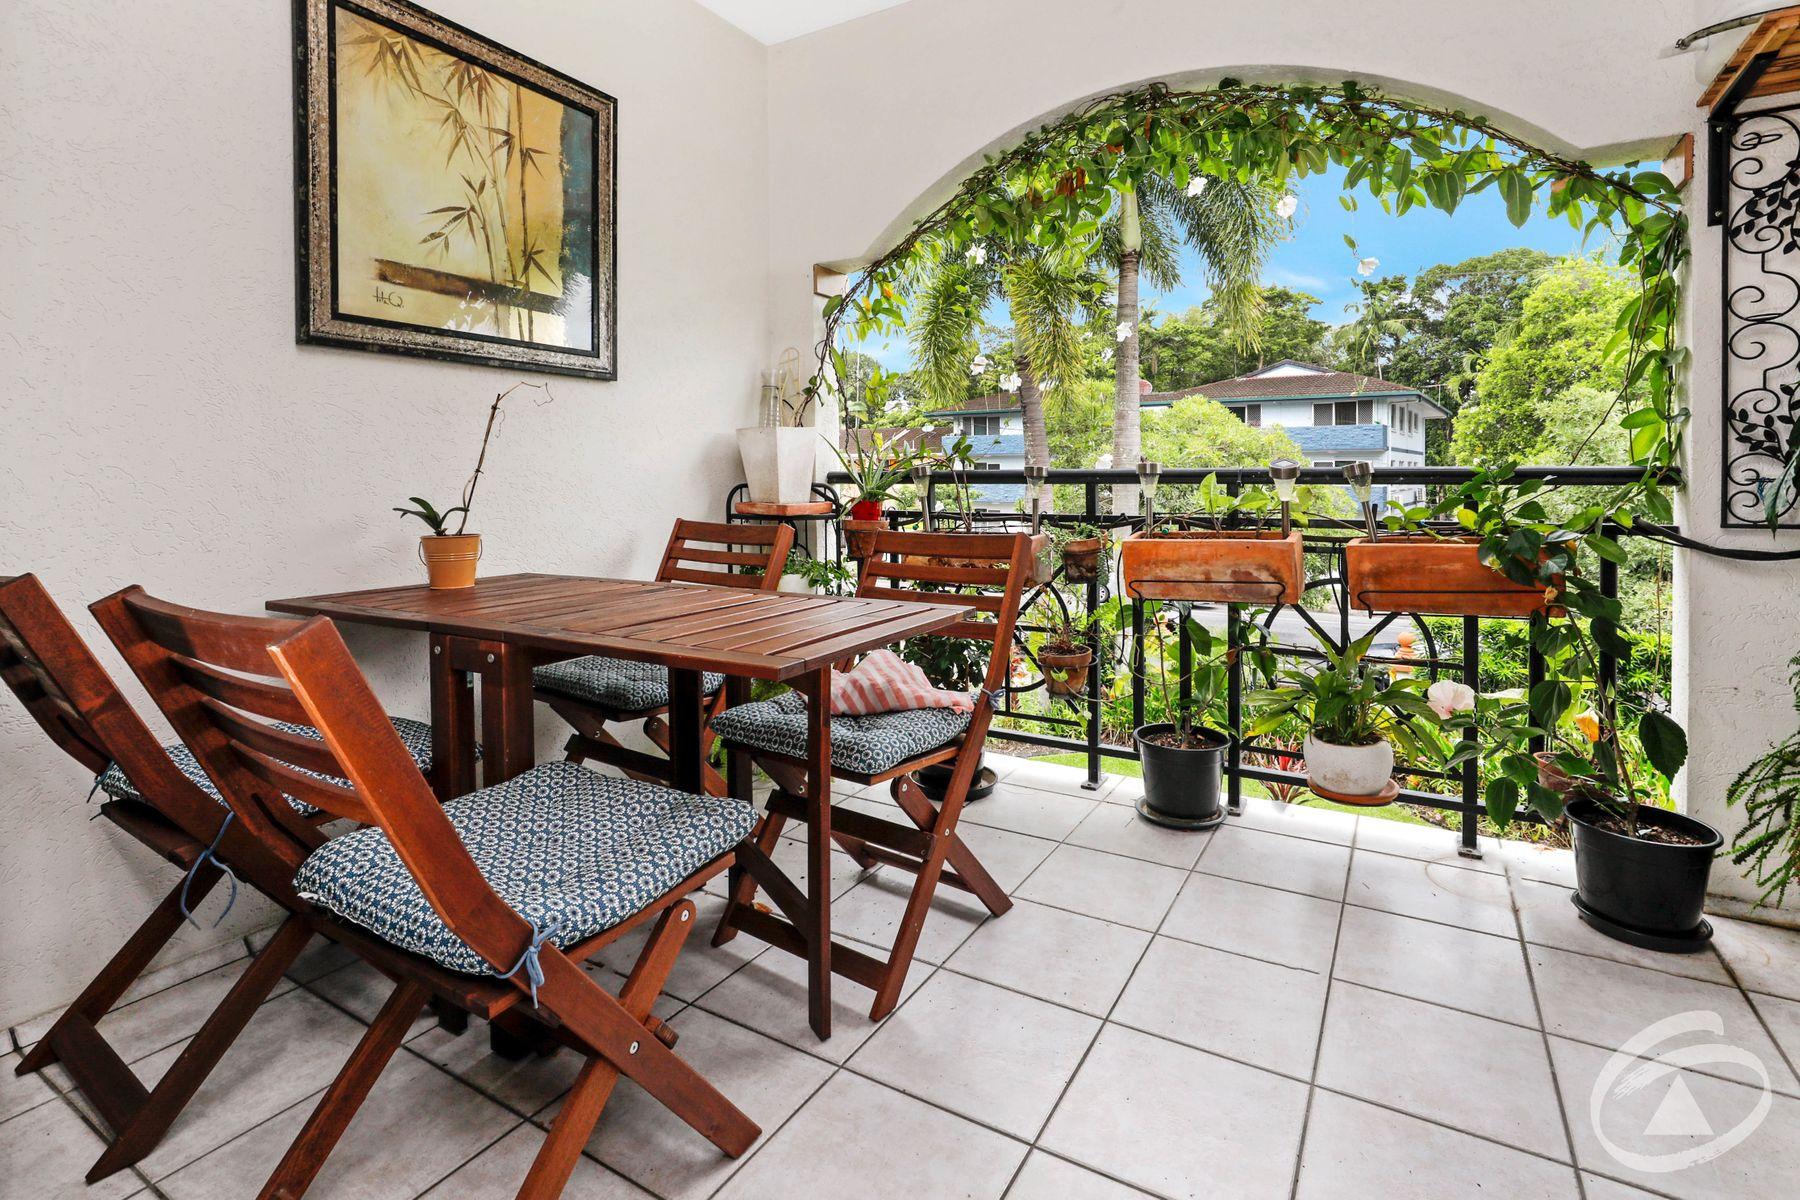 6/34-36 Digger Street, Cairns North, QLD 4870